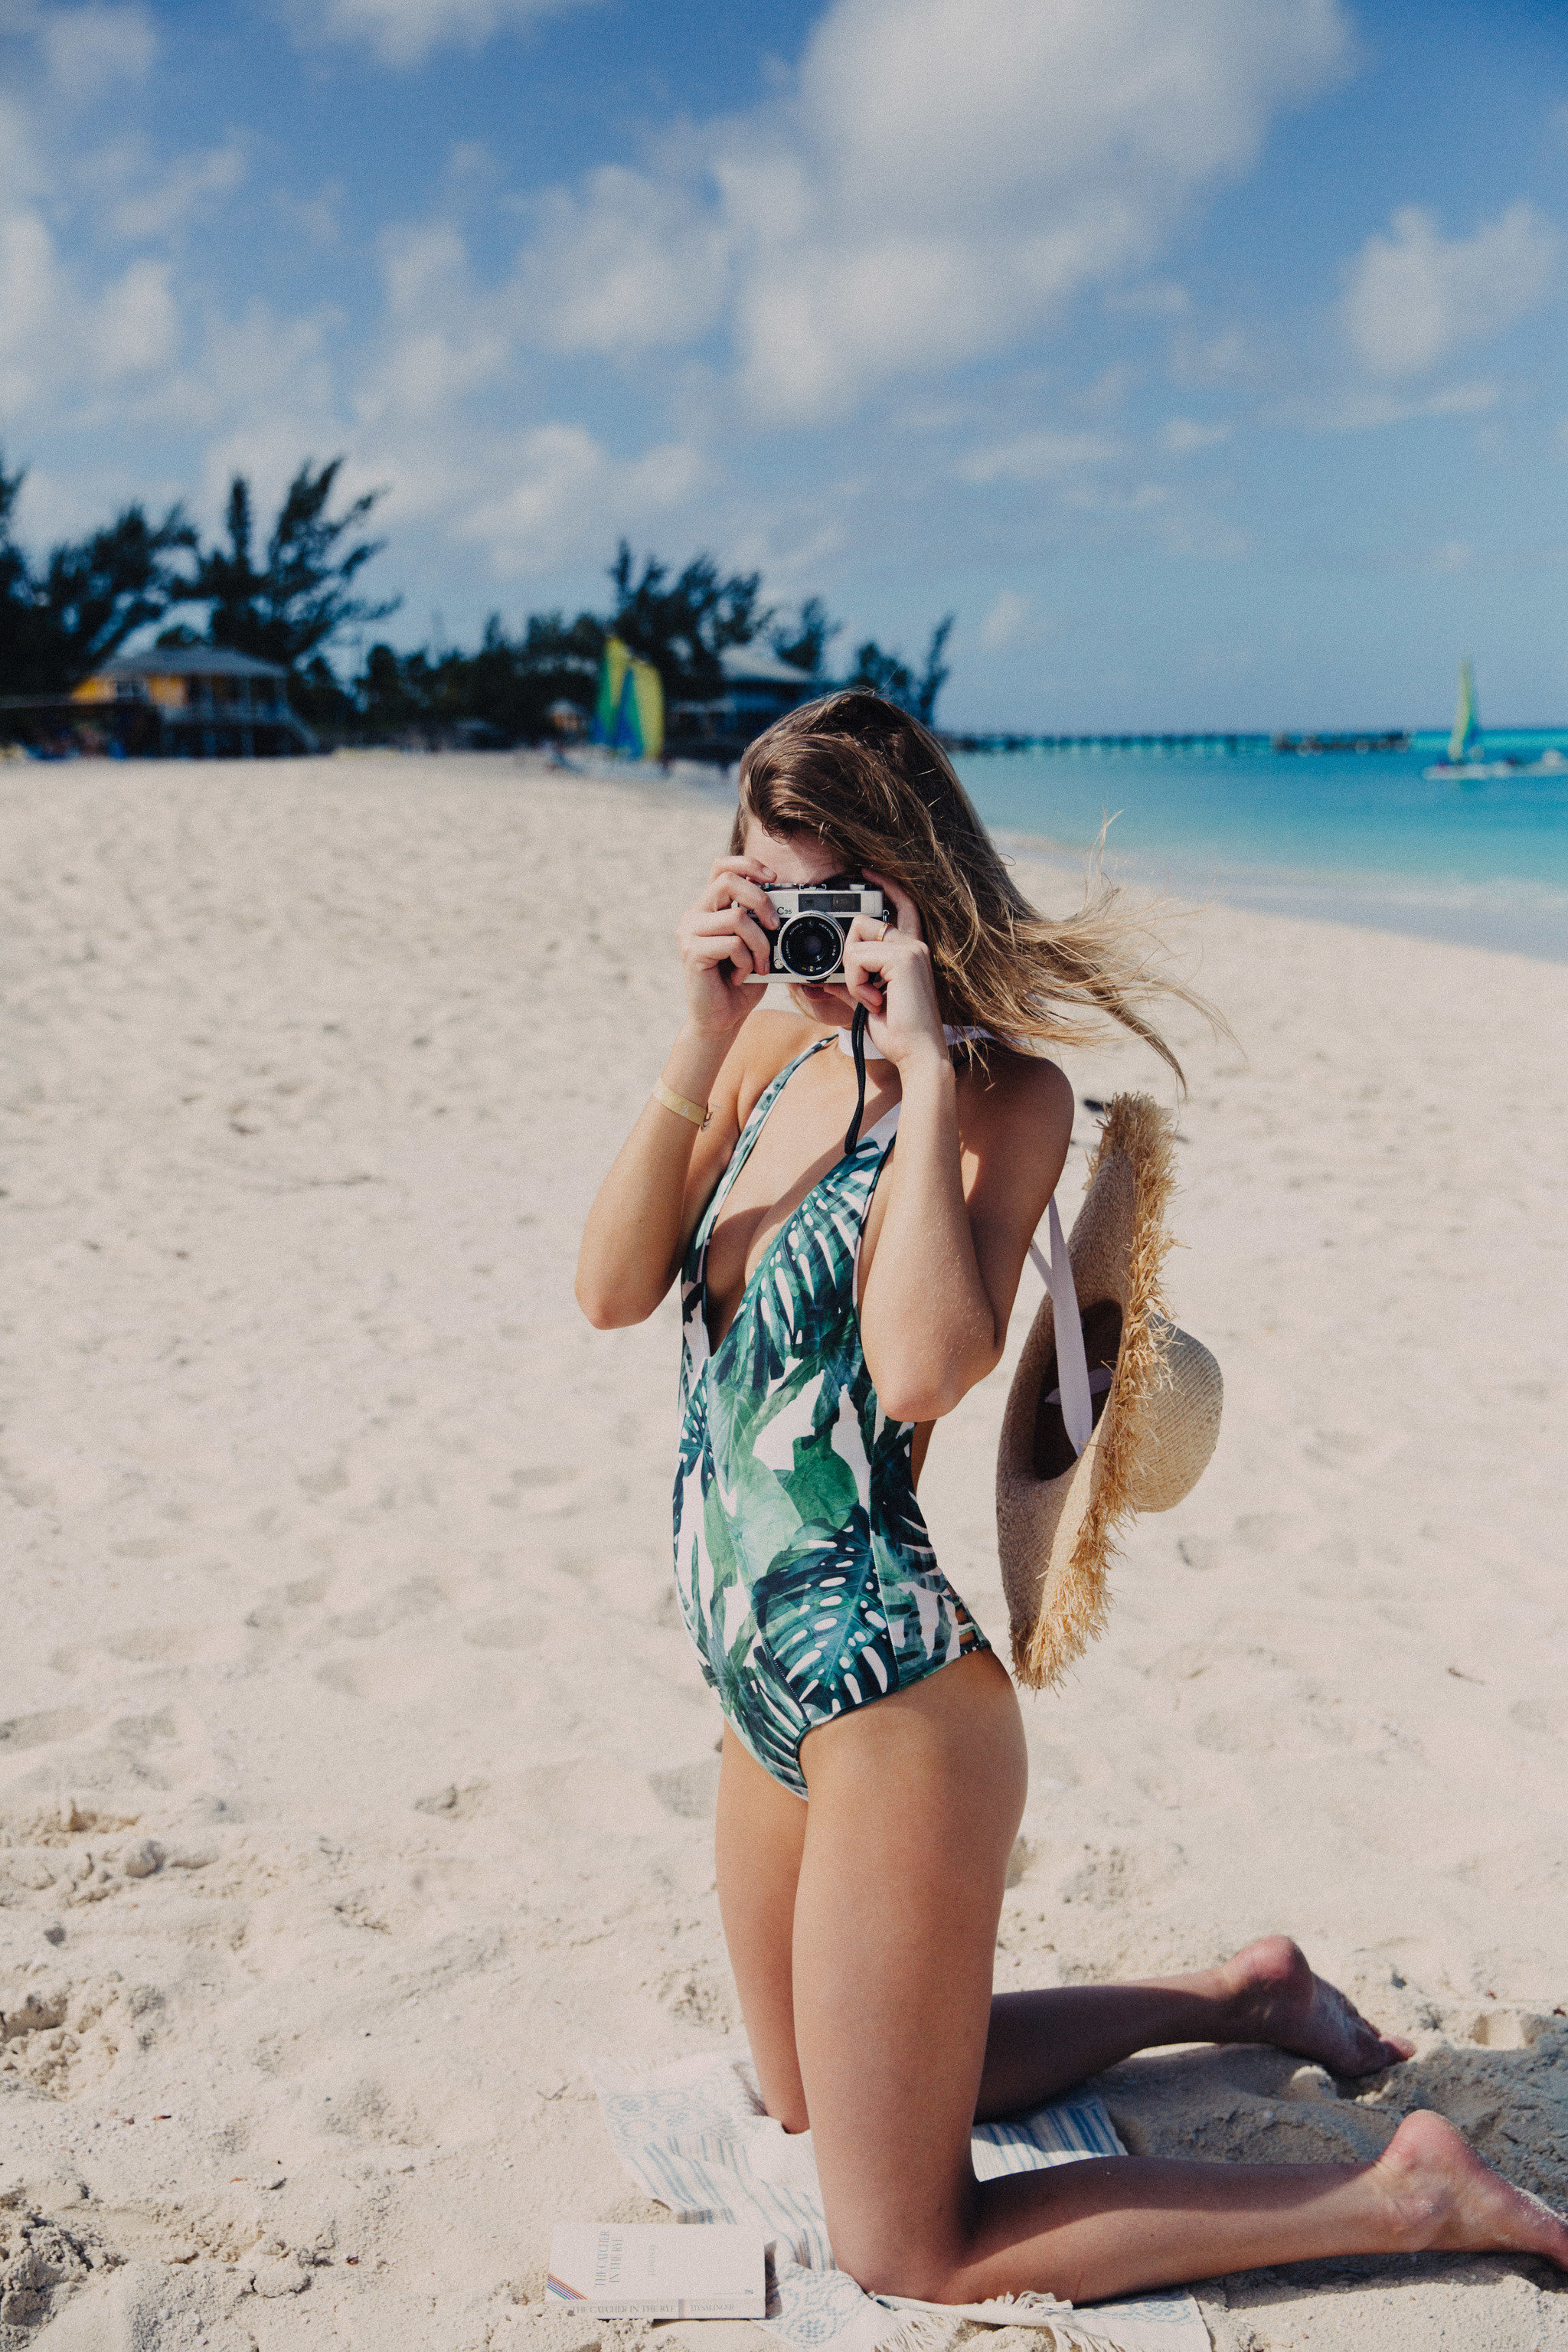 Hotels Style + Design Travel Shop Trip Ideas outdoor Beach sky person swimwear woman ground clothing vacation Sea summer girl fun sun tanning model shorts sand swimsuit Ocean long hair photo shoot shore sandy